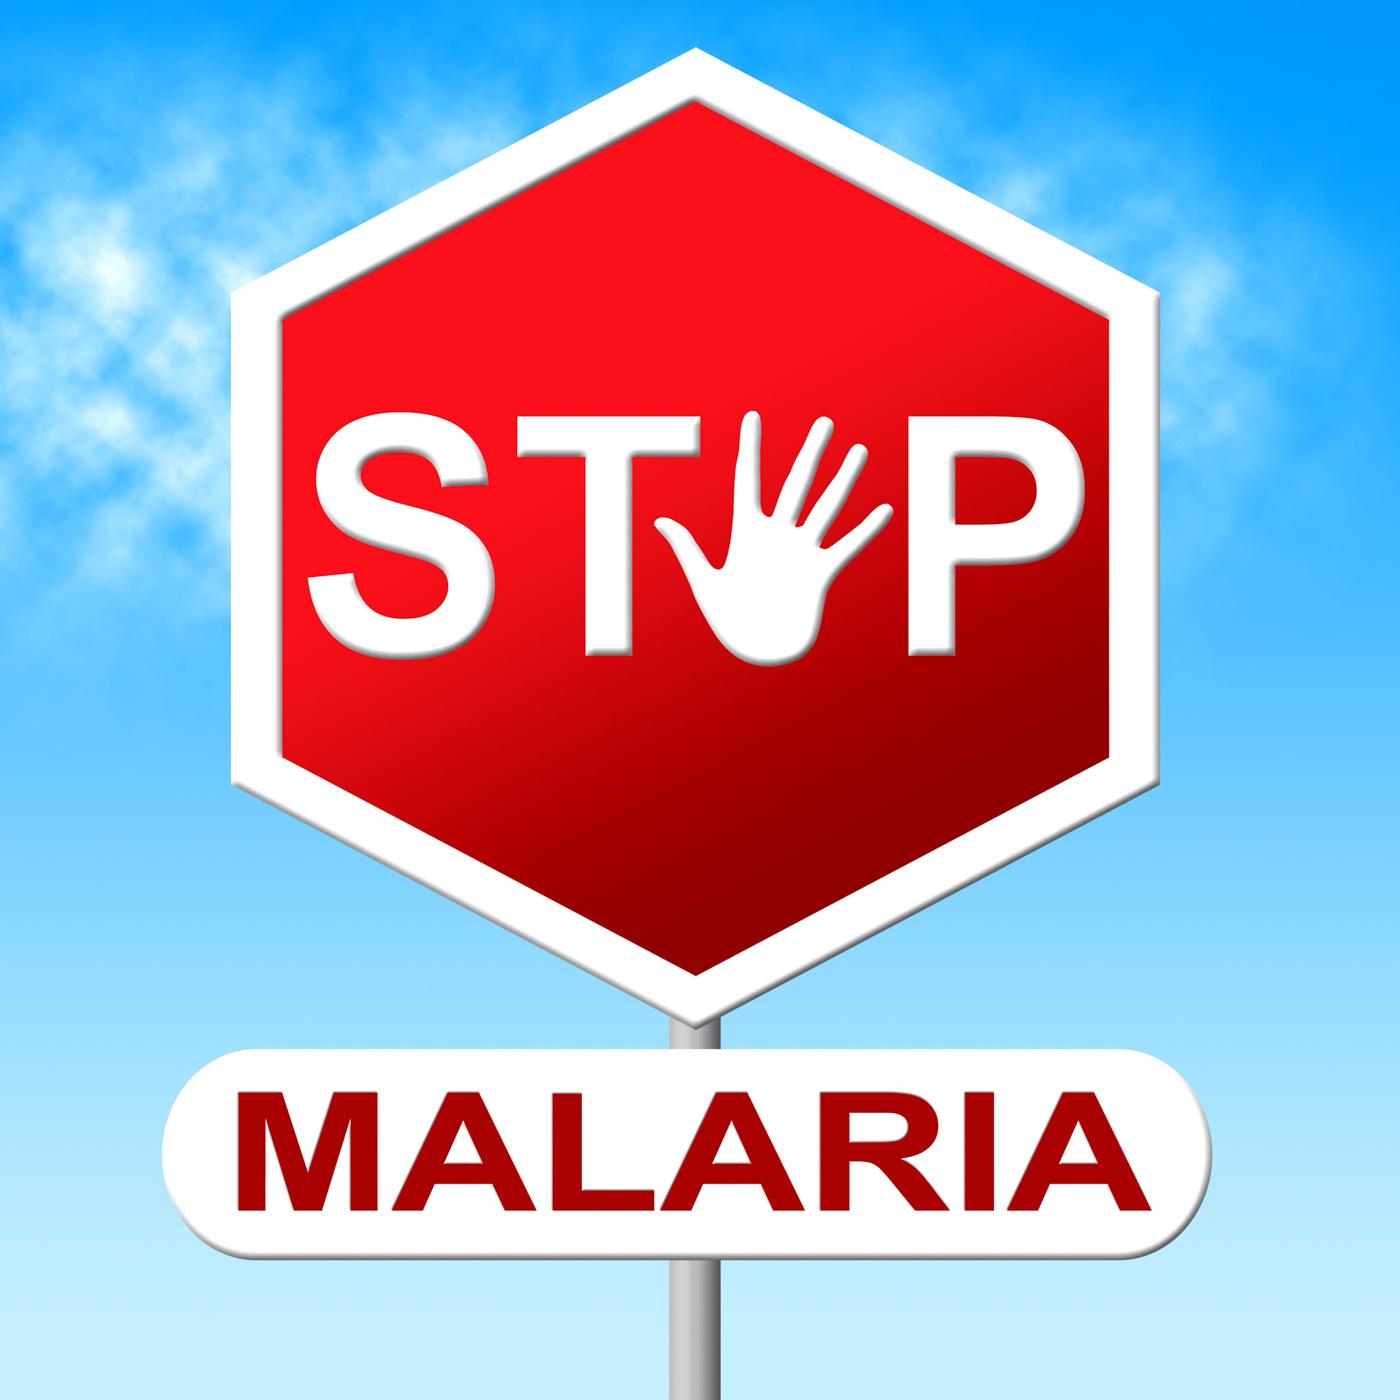 Stop malaria indicates warning sign and caution photo